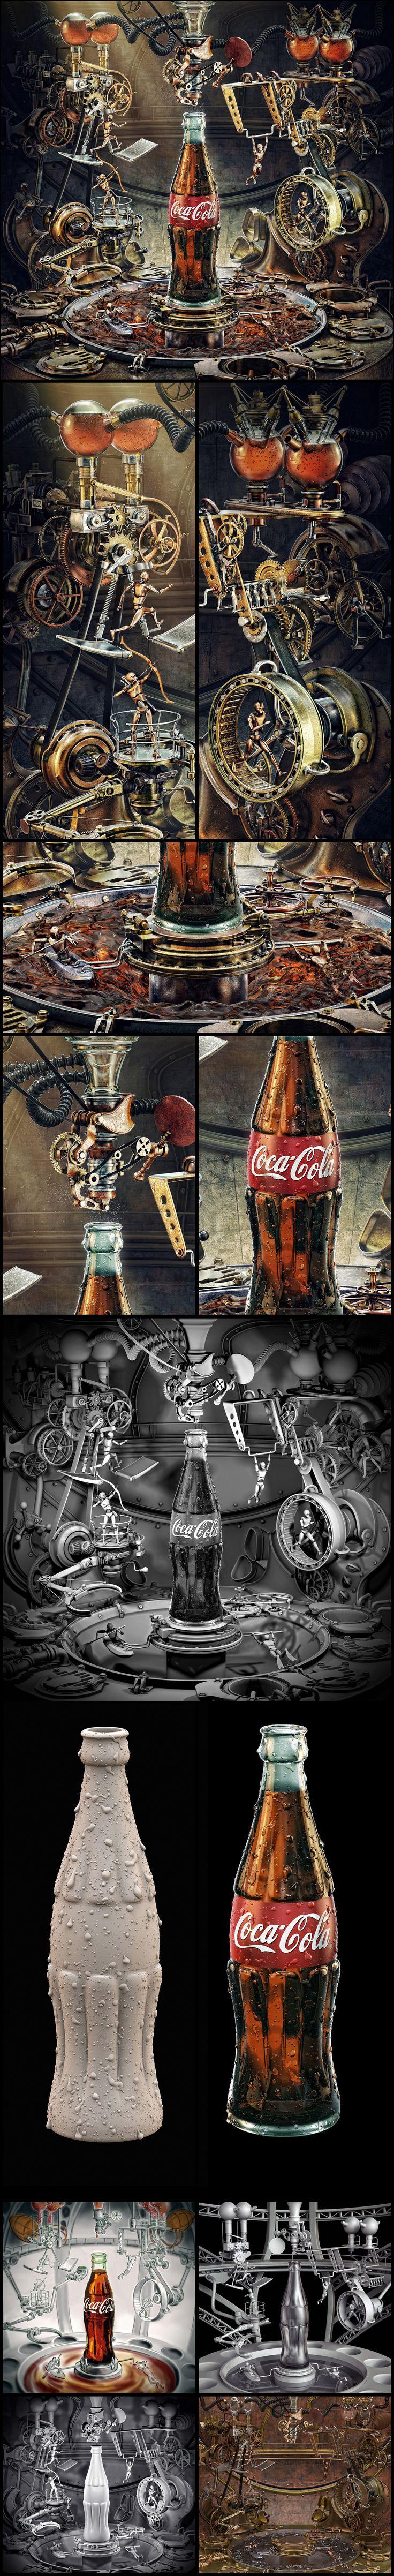 Coca Cola Olympic Games_clouce up by AleksCG.deviantart.com on @deviantART